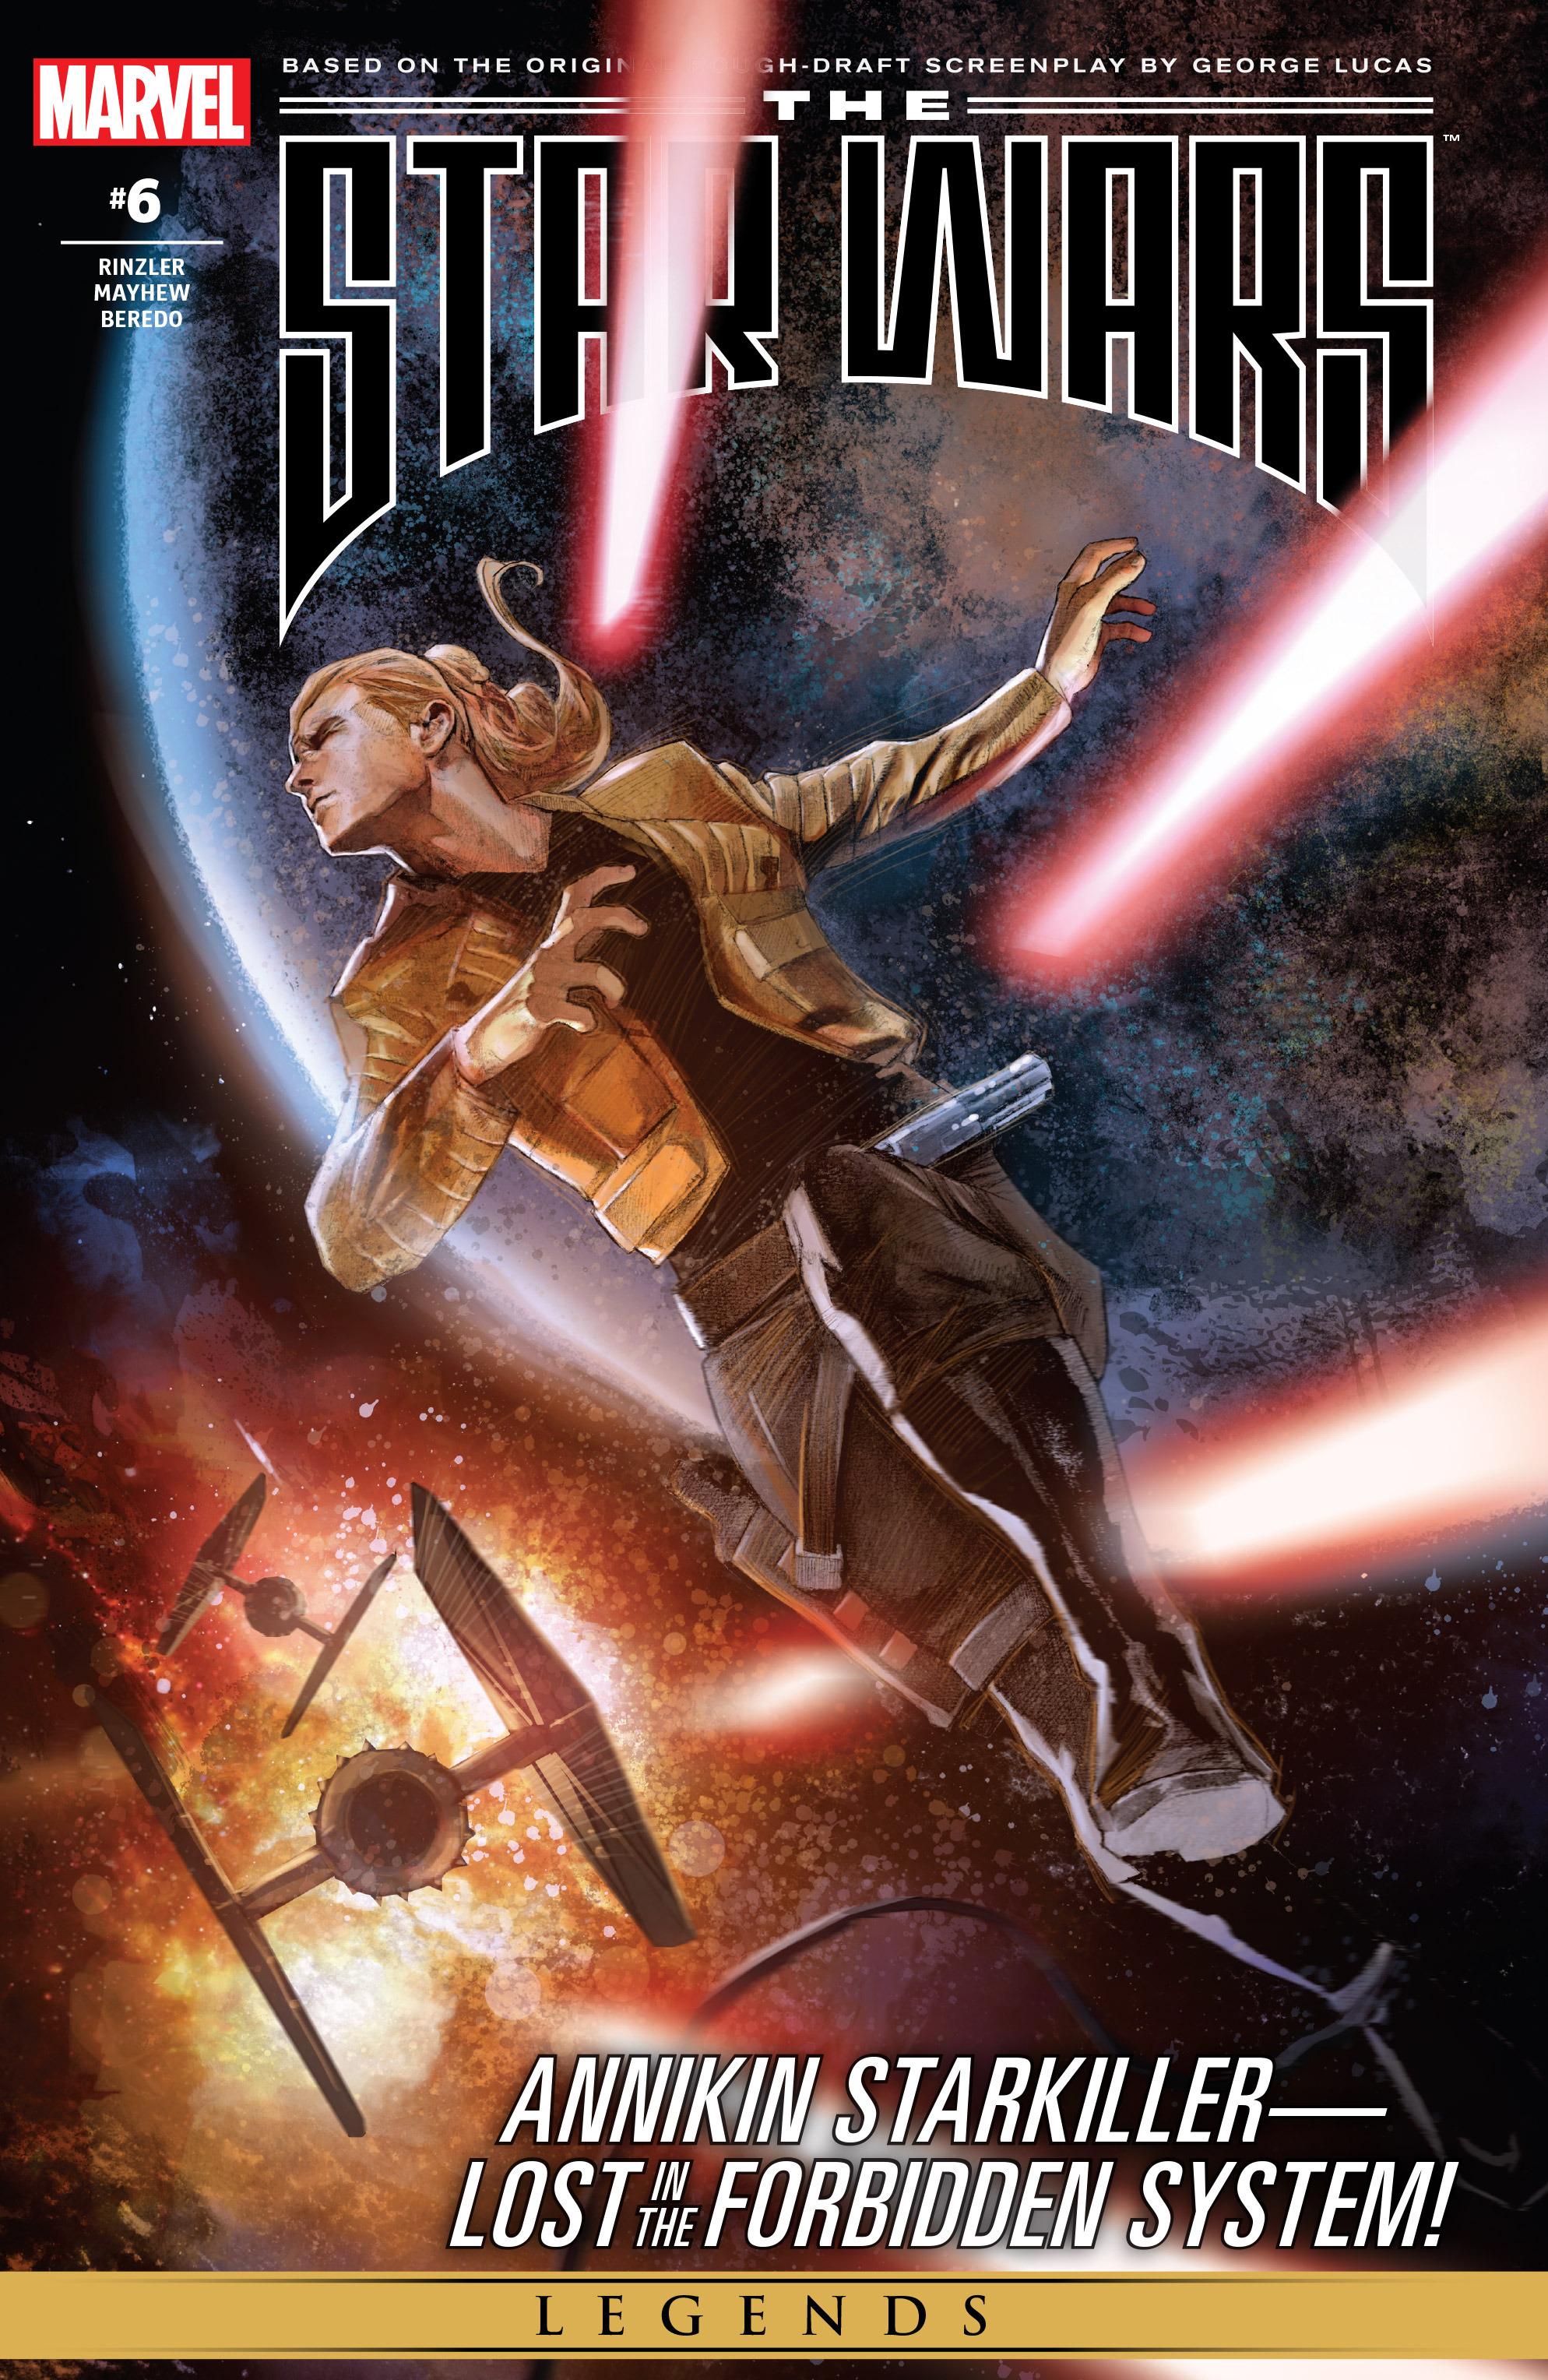 THE STAR WARS comic (2015, Marvel edition) Vol.7 1